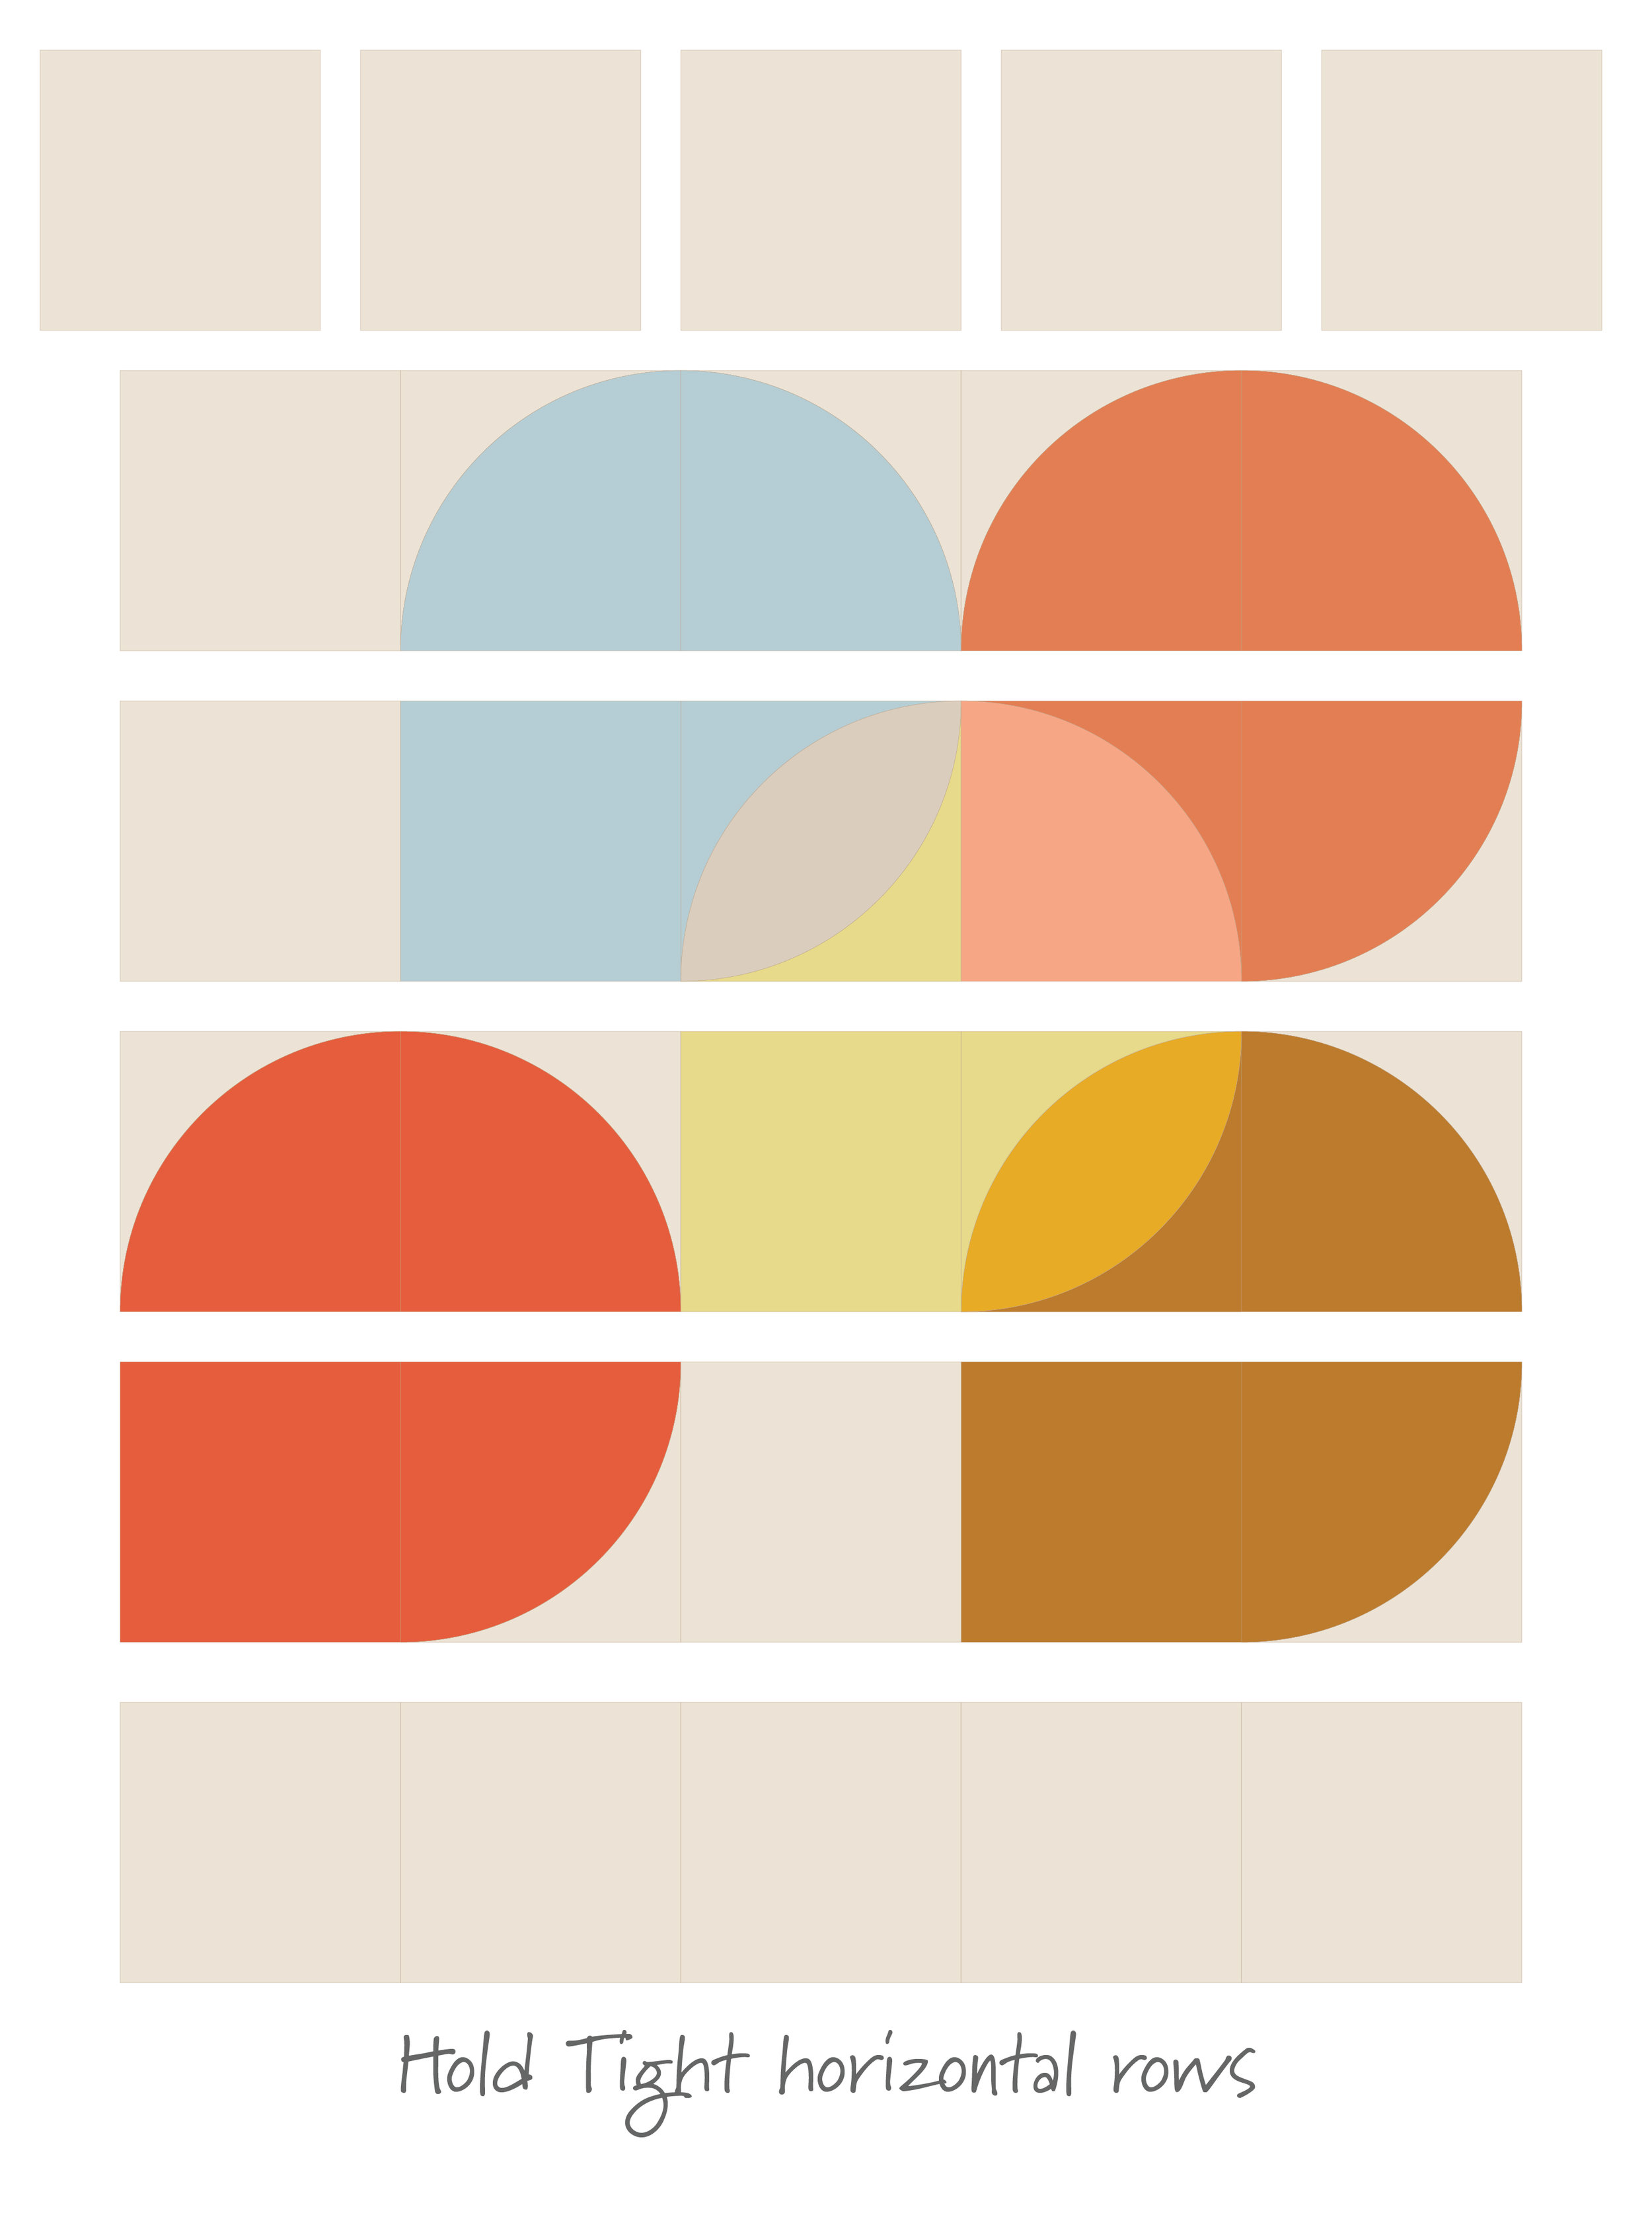 Hold Tight horizontal rows-02.jpg